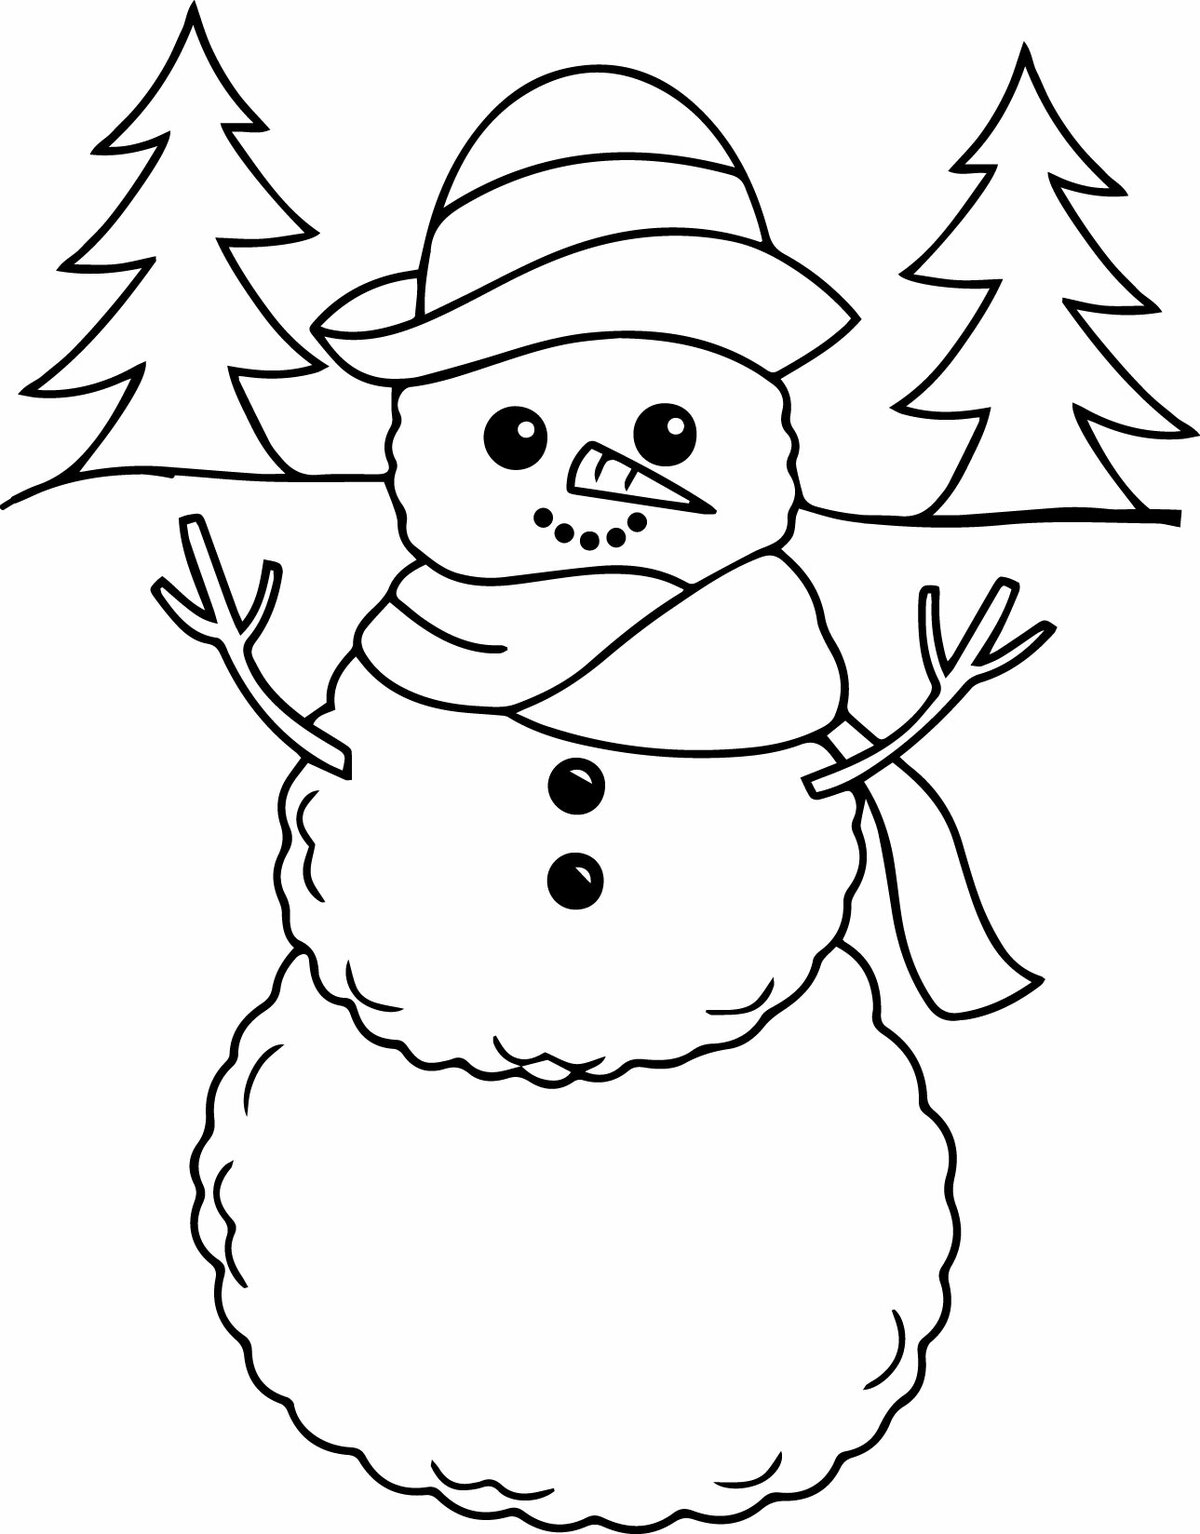 Картинки на зиму для срисовки, смешно спать картинка